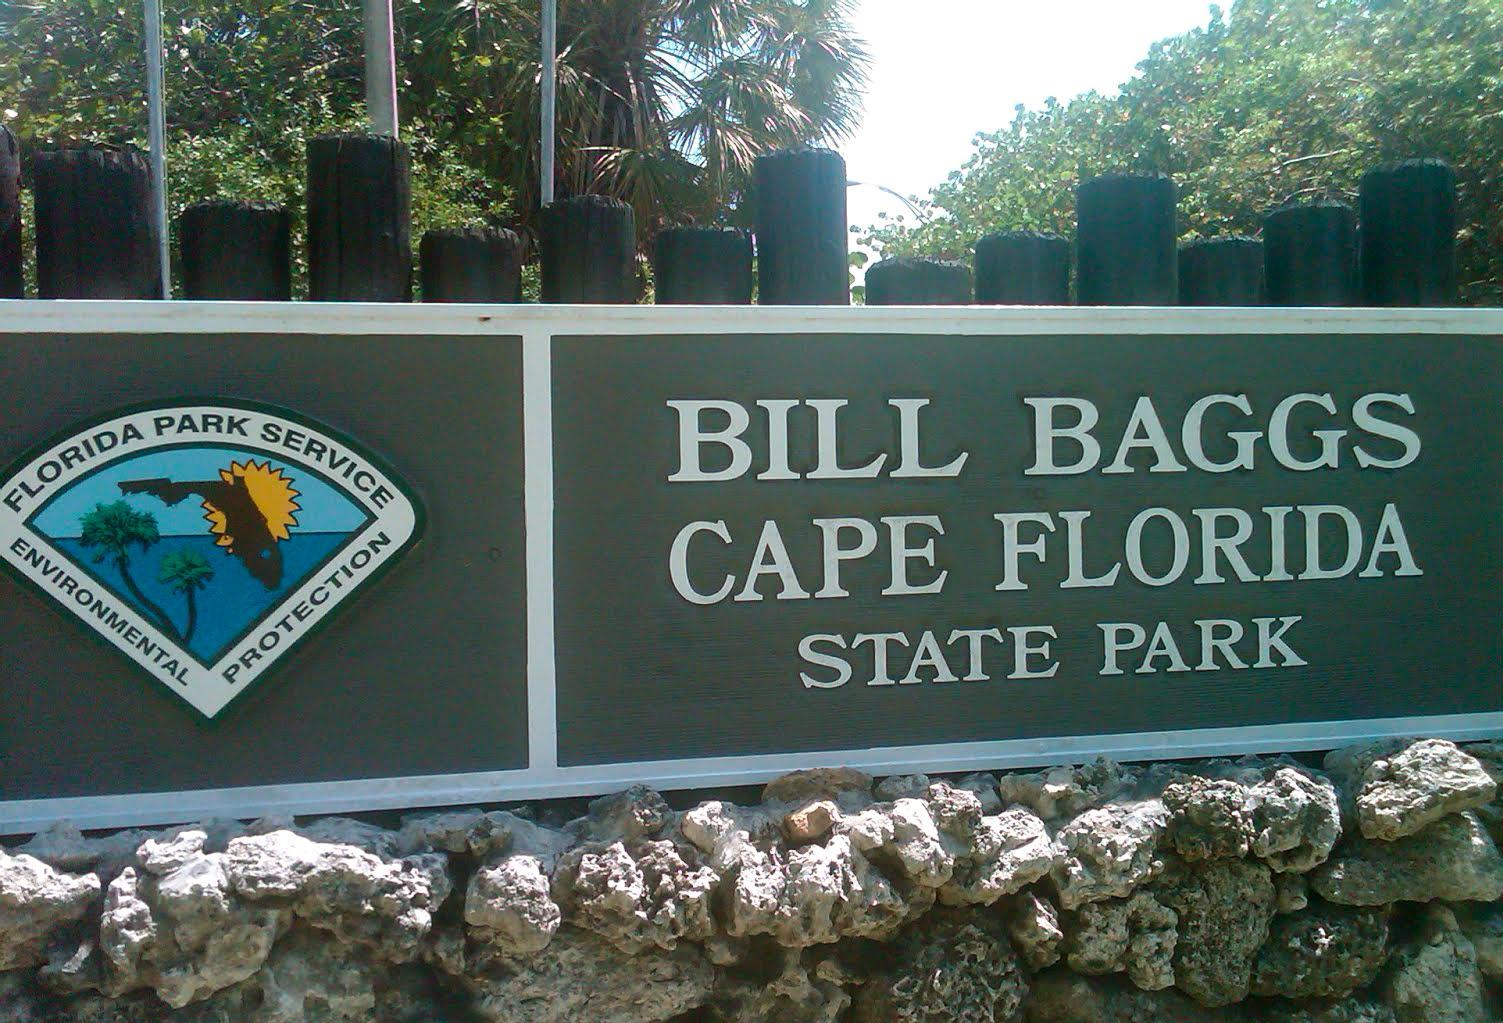 Bill-Baggs-Cape-Florida.jpg